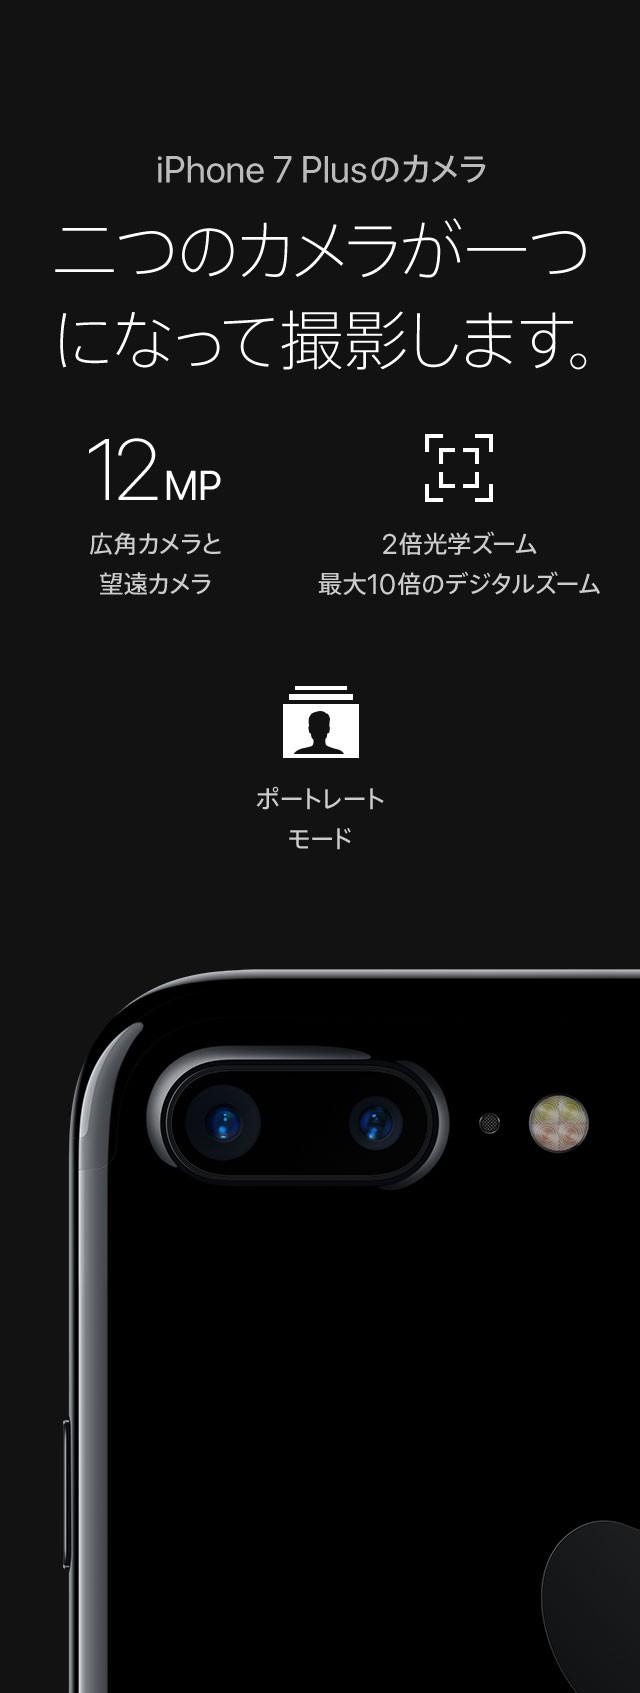 iPhone 7 Plusのカメラ  二つのカメラが一つになって撮影します。